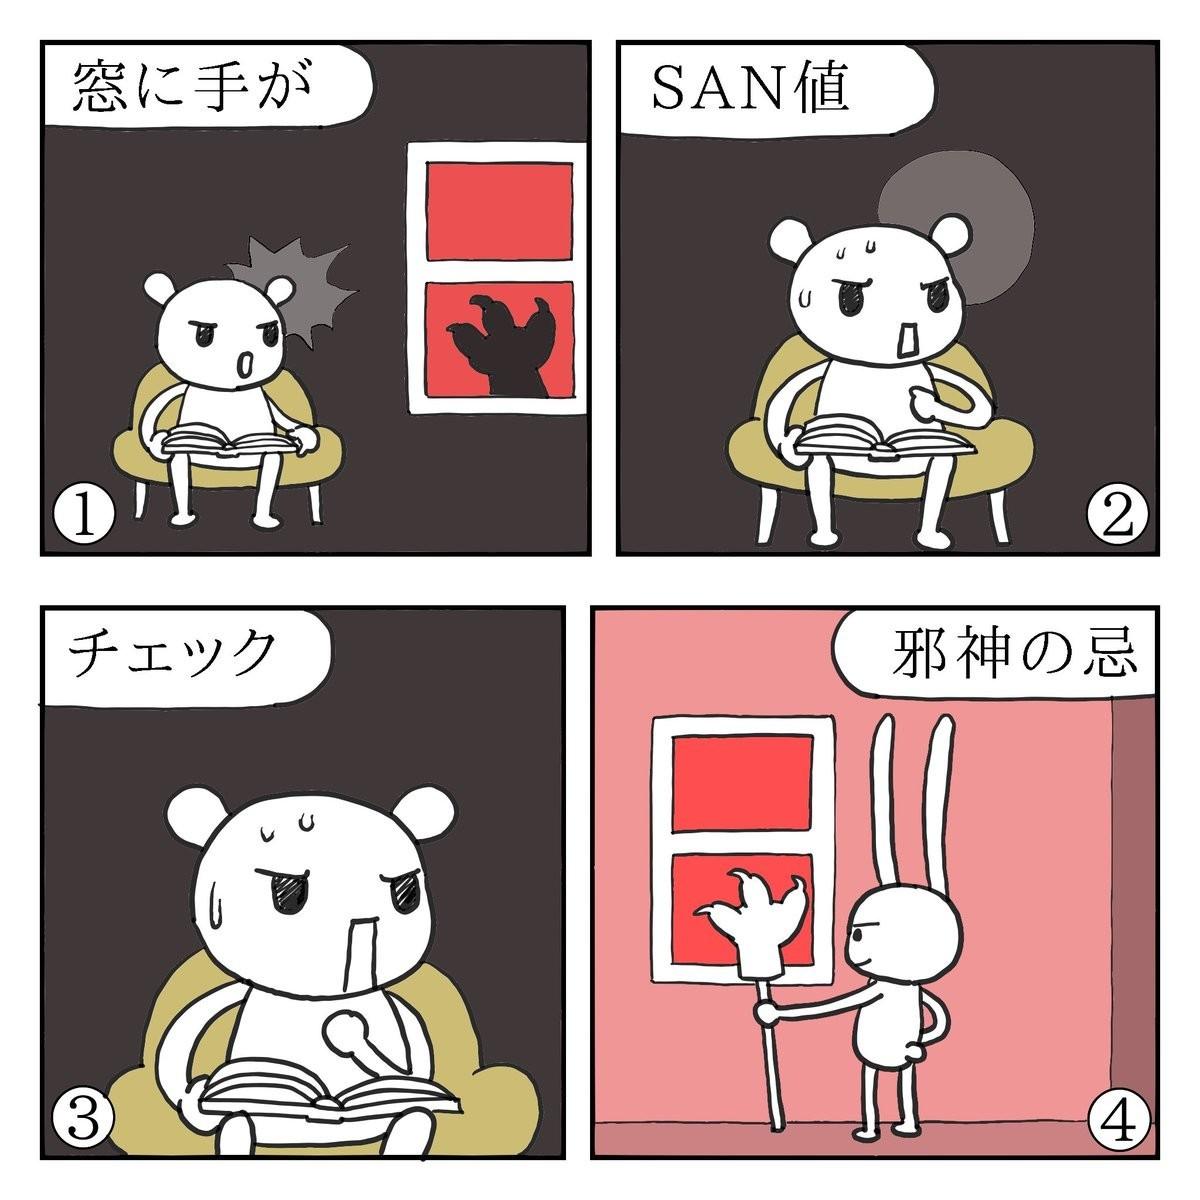 f:id:kanarihikokuma:20190315082823j:image:w330